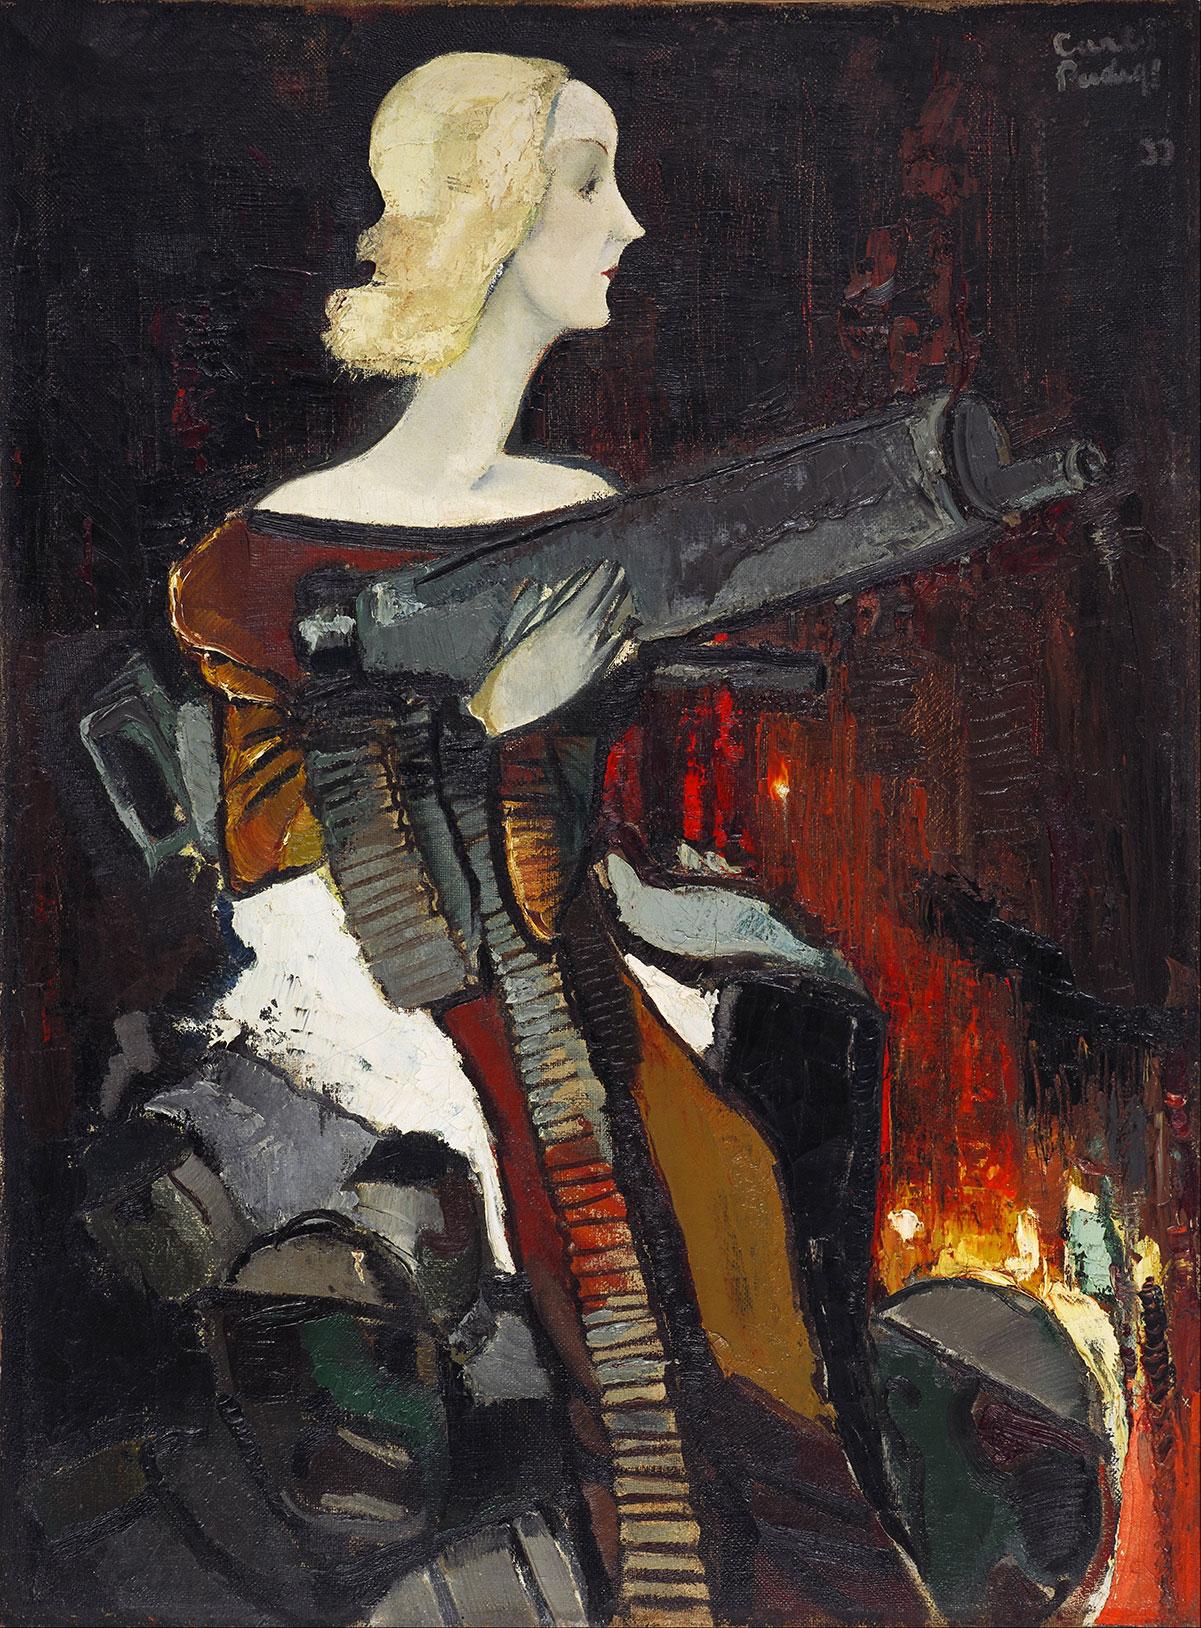 Madonna with machine gun /Madonna ar ložmeteju/ + Padegs, Karlis *magnifico